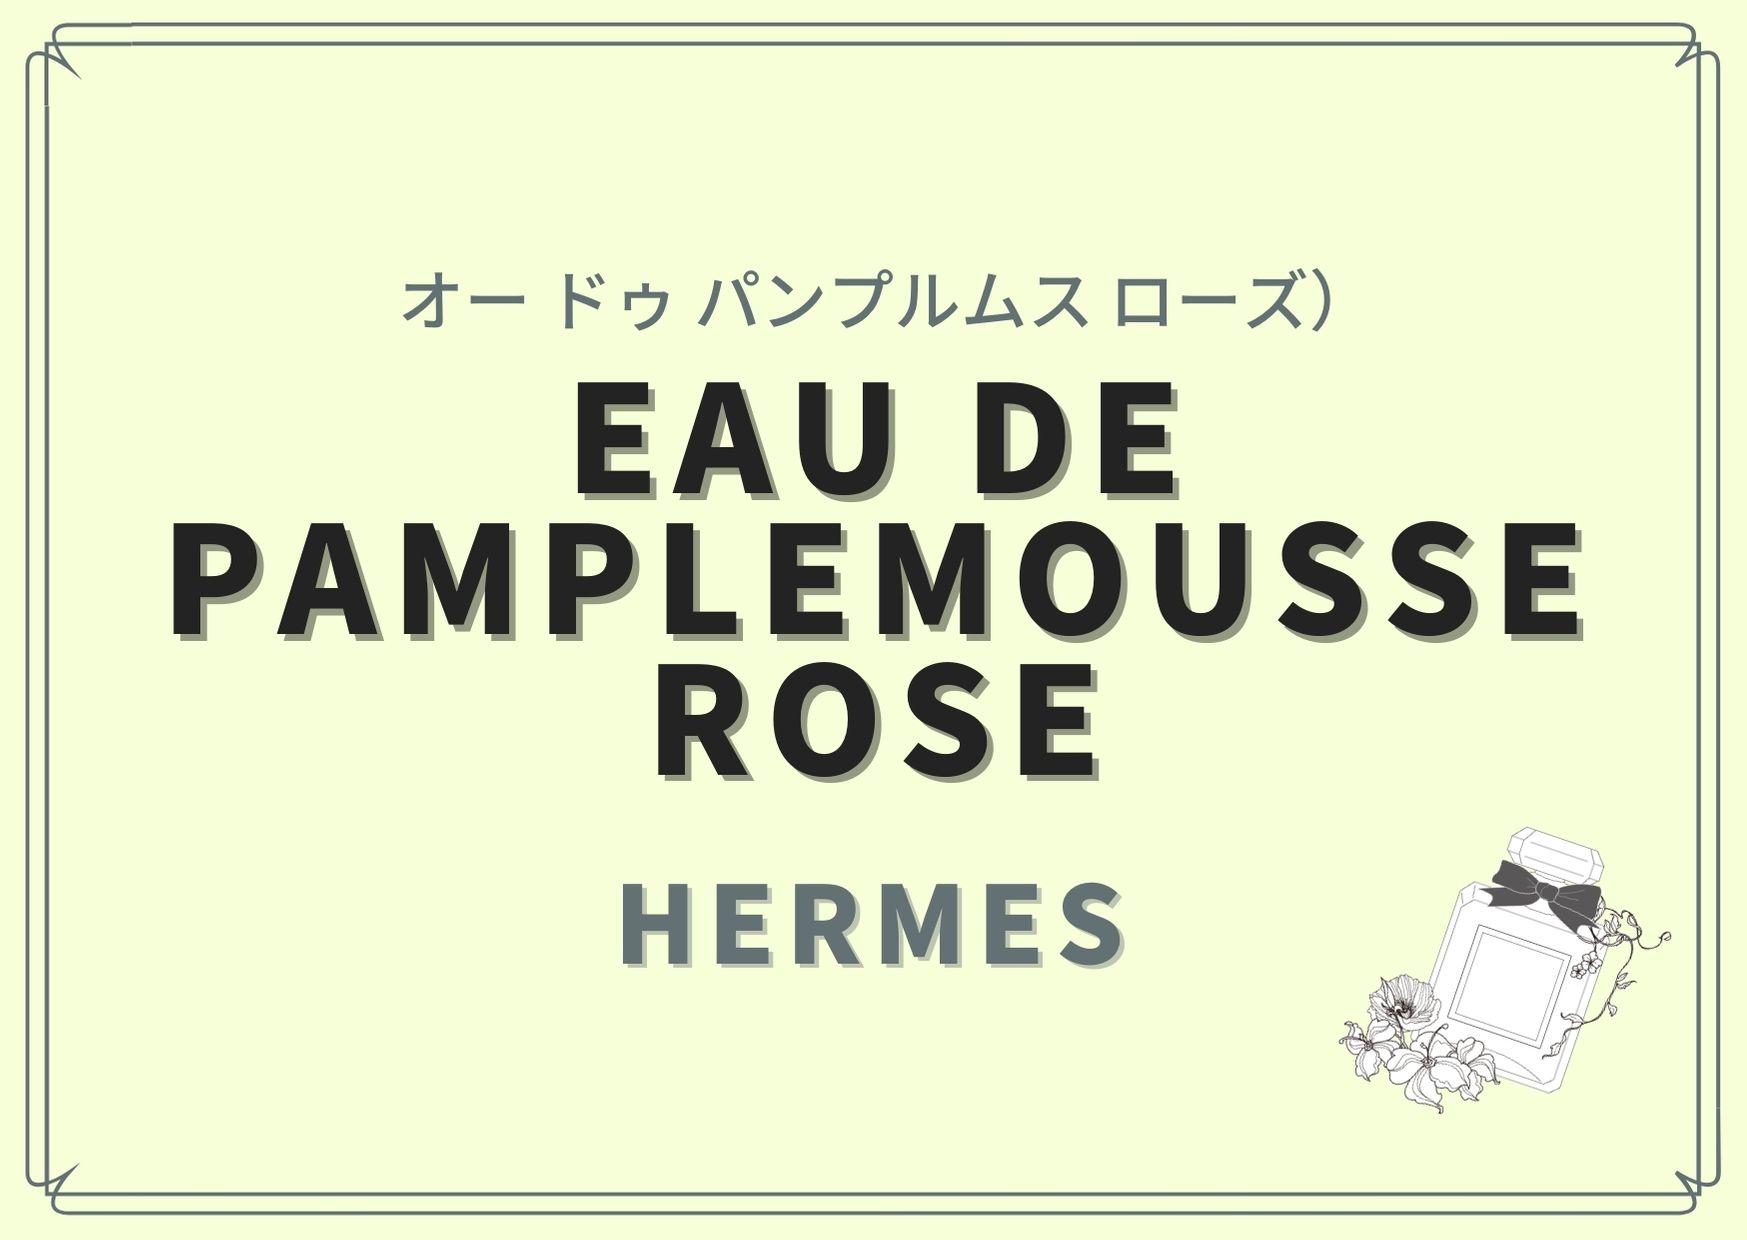 Eau de Pamplemousse Rose(オー ドゥ パンプルムス ローズ)/HERMES(エルメス)